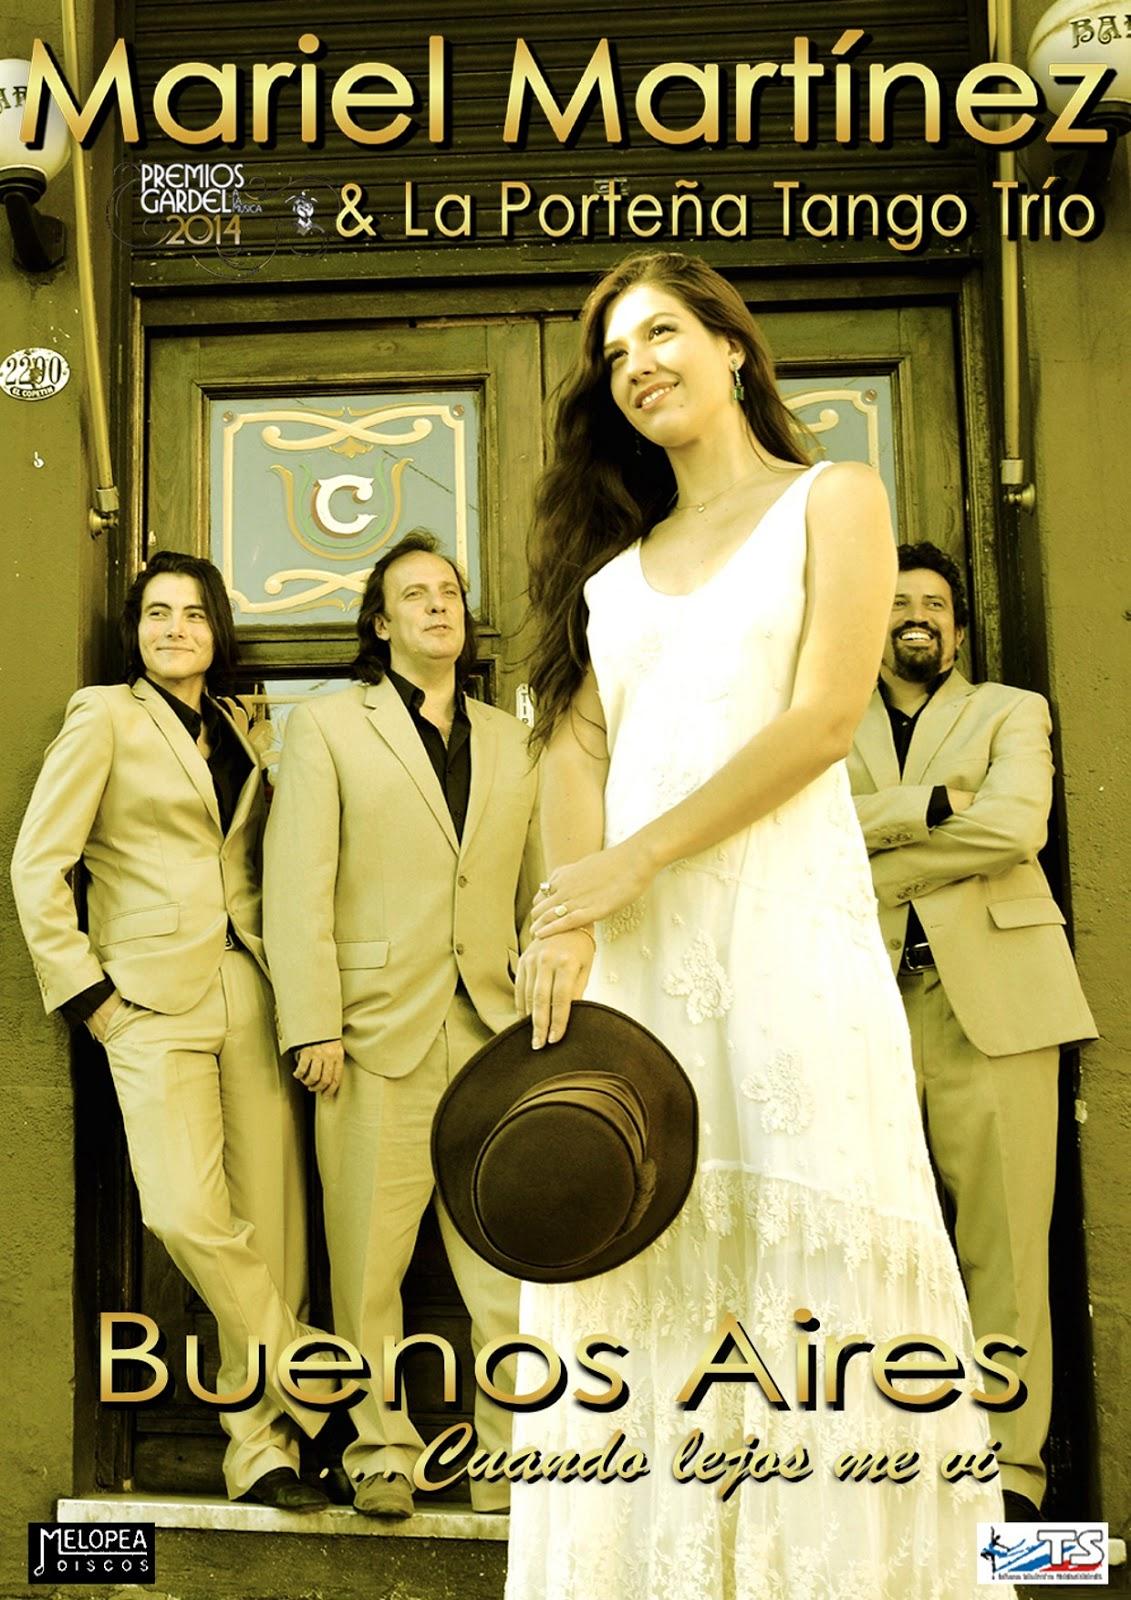 tango-teatro-madrid-que-ver-mariel-martinez-imprescindible